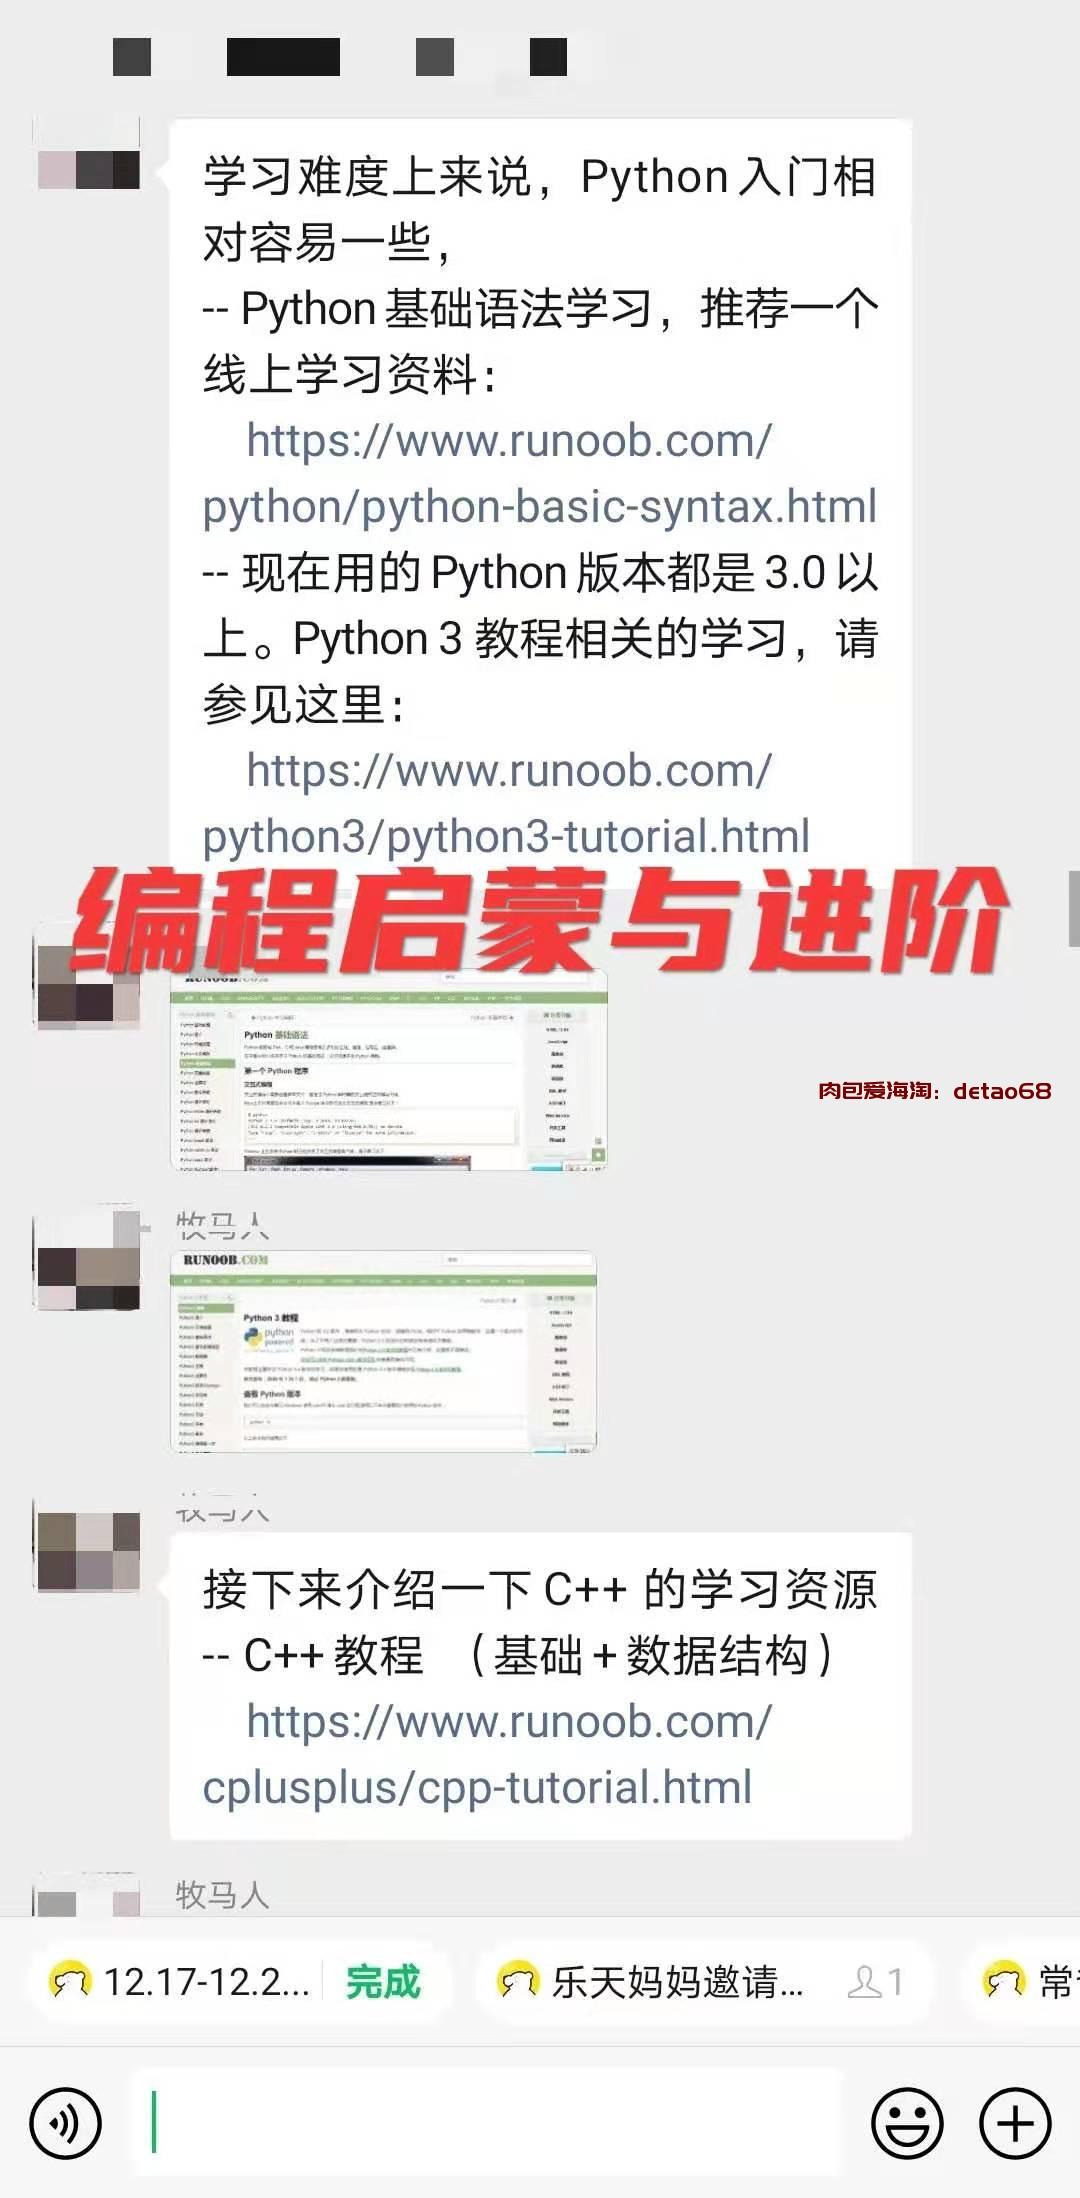 C:\Users\wangl\AppData\Local\Temp\WeChat Files\c4f8d96ec988ef822e59a5b1452d603.jpg